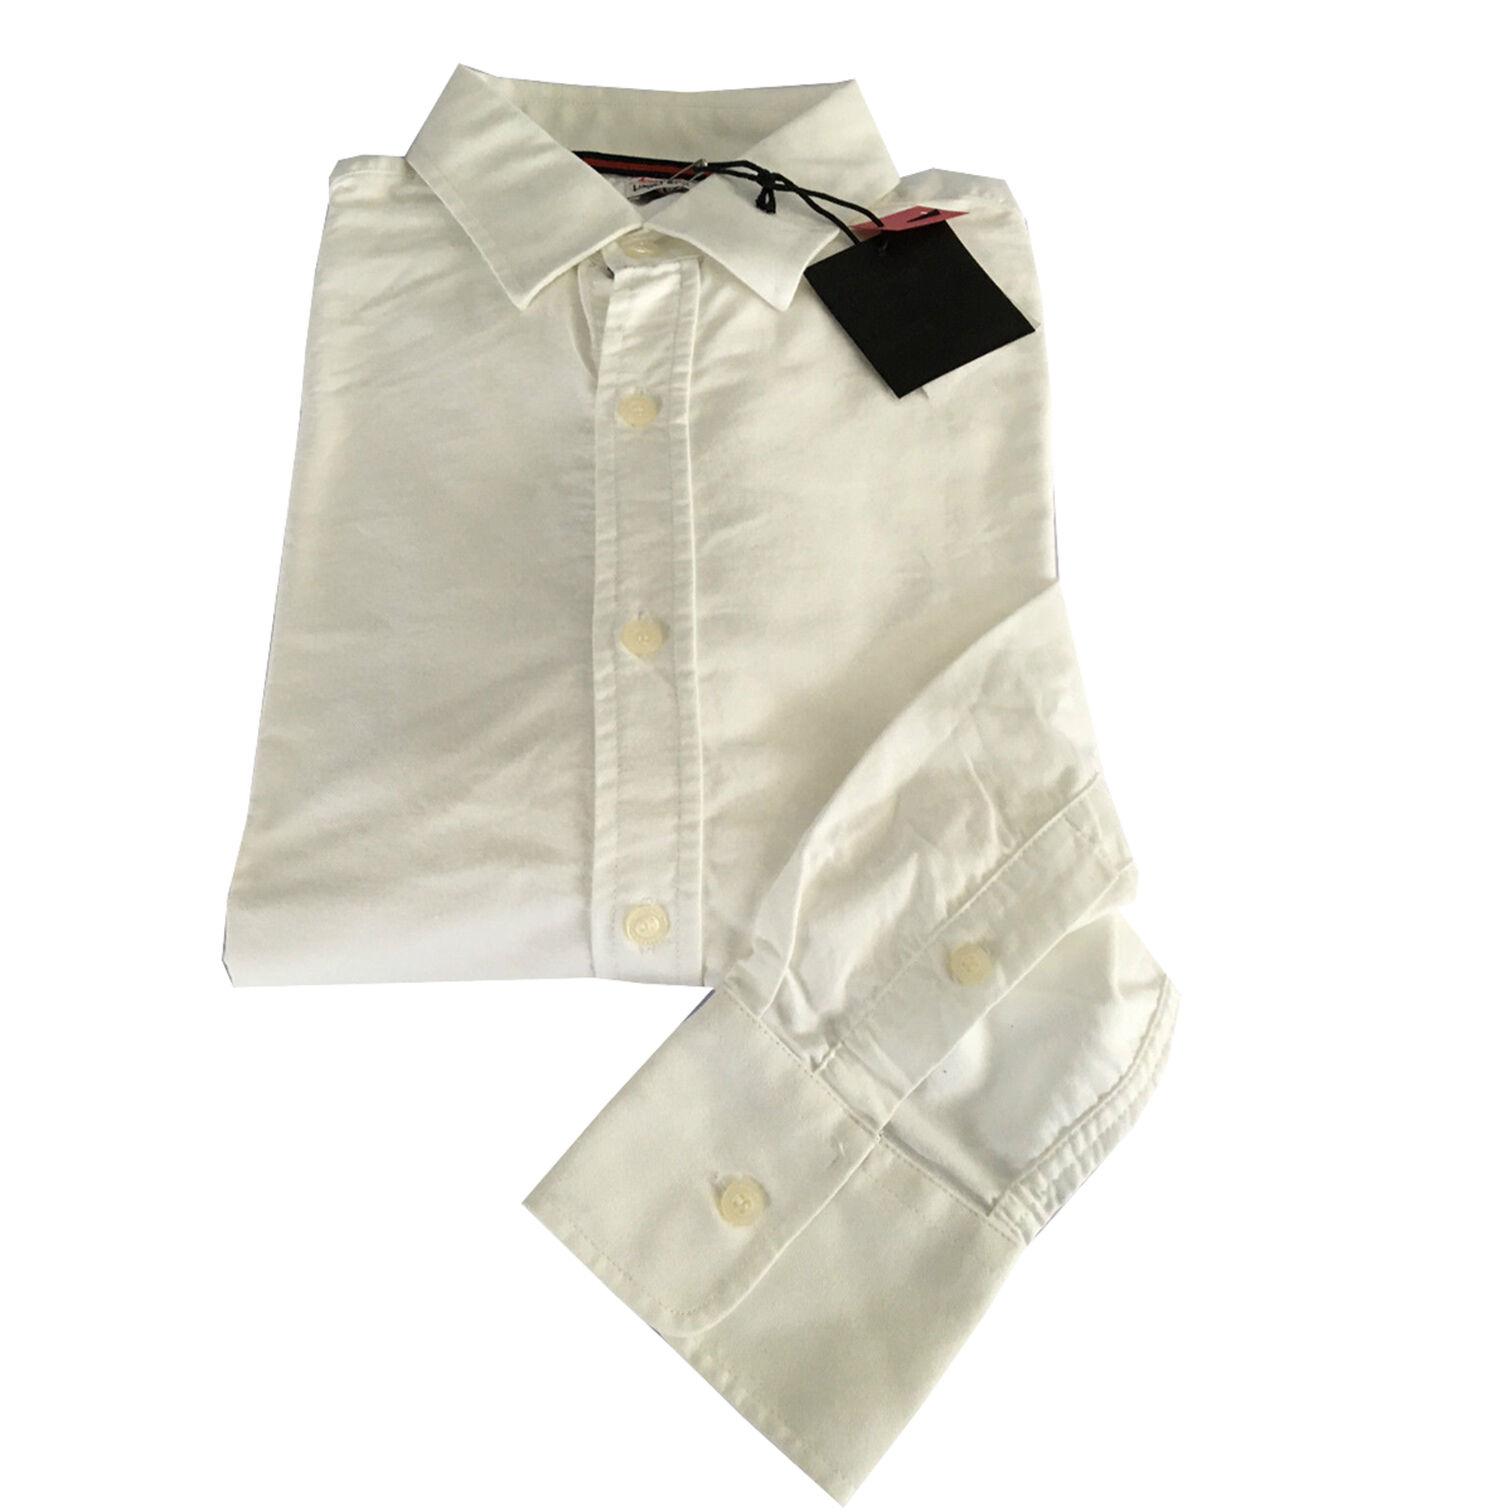 VINTAGE 55 linea LUXURY BASIC men's shirts Oxford white 100% cotton slim L